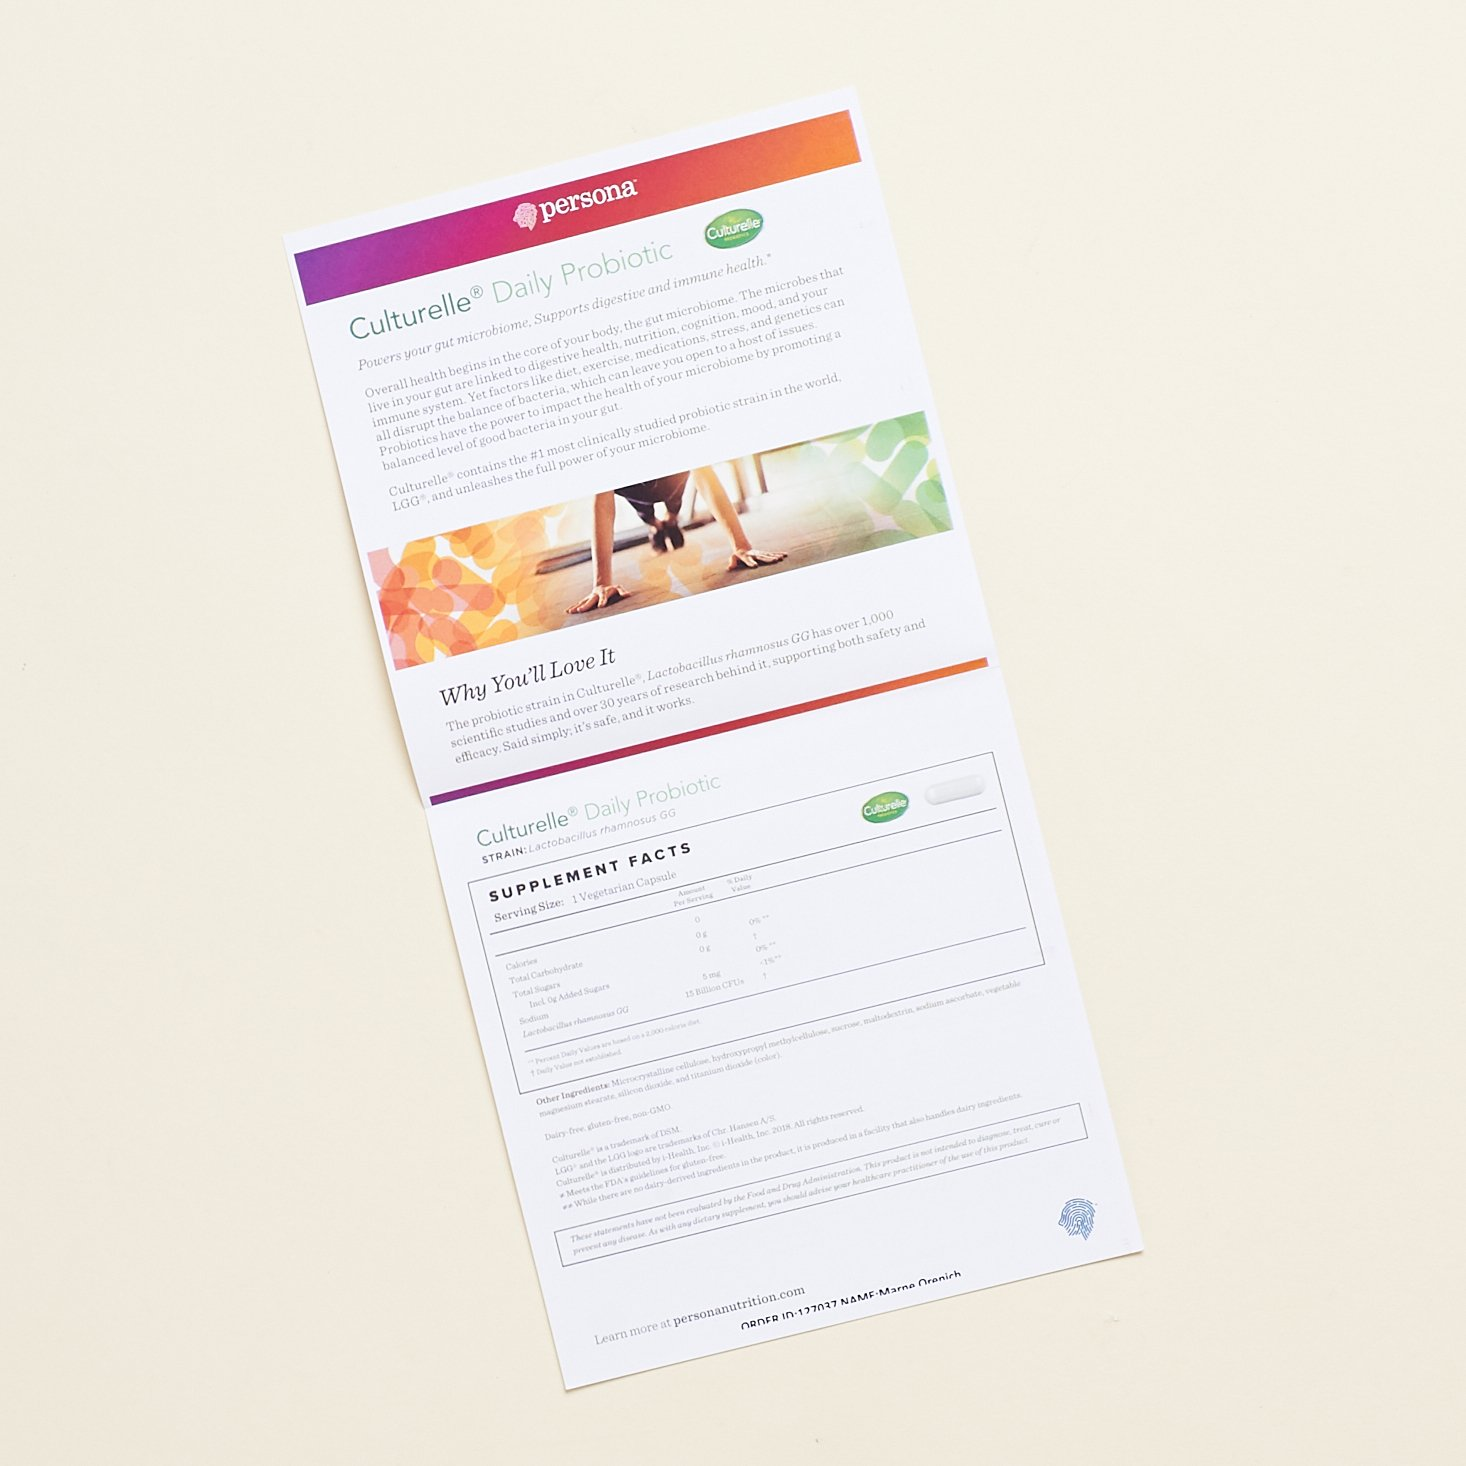 Culturelle Daily Probiotic info sheet